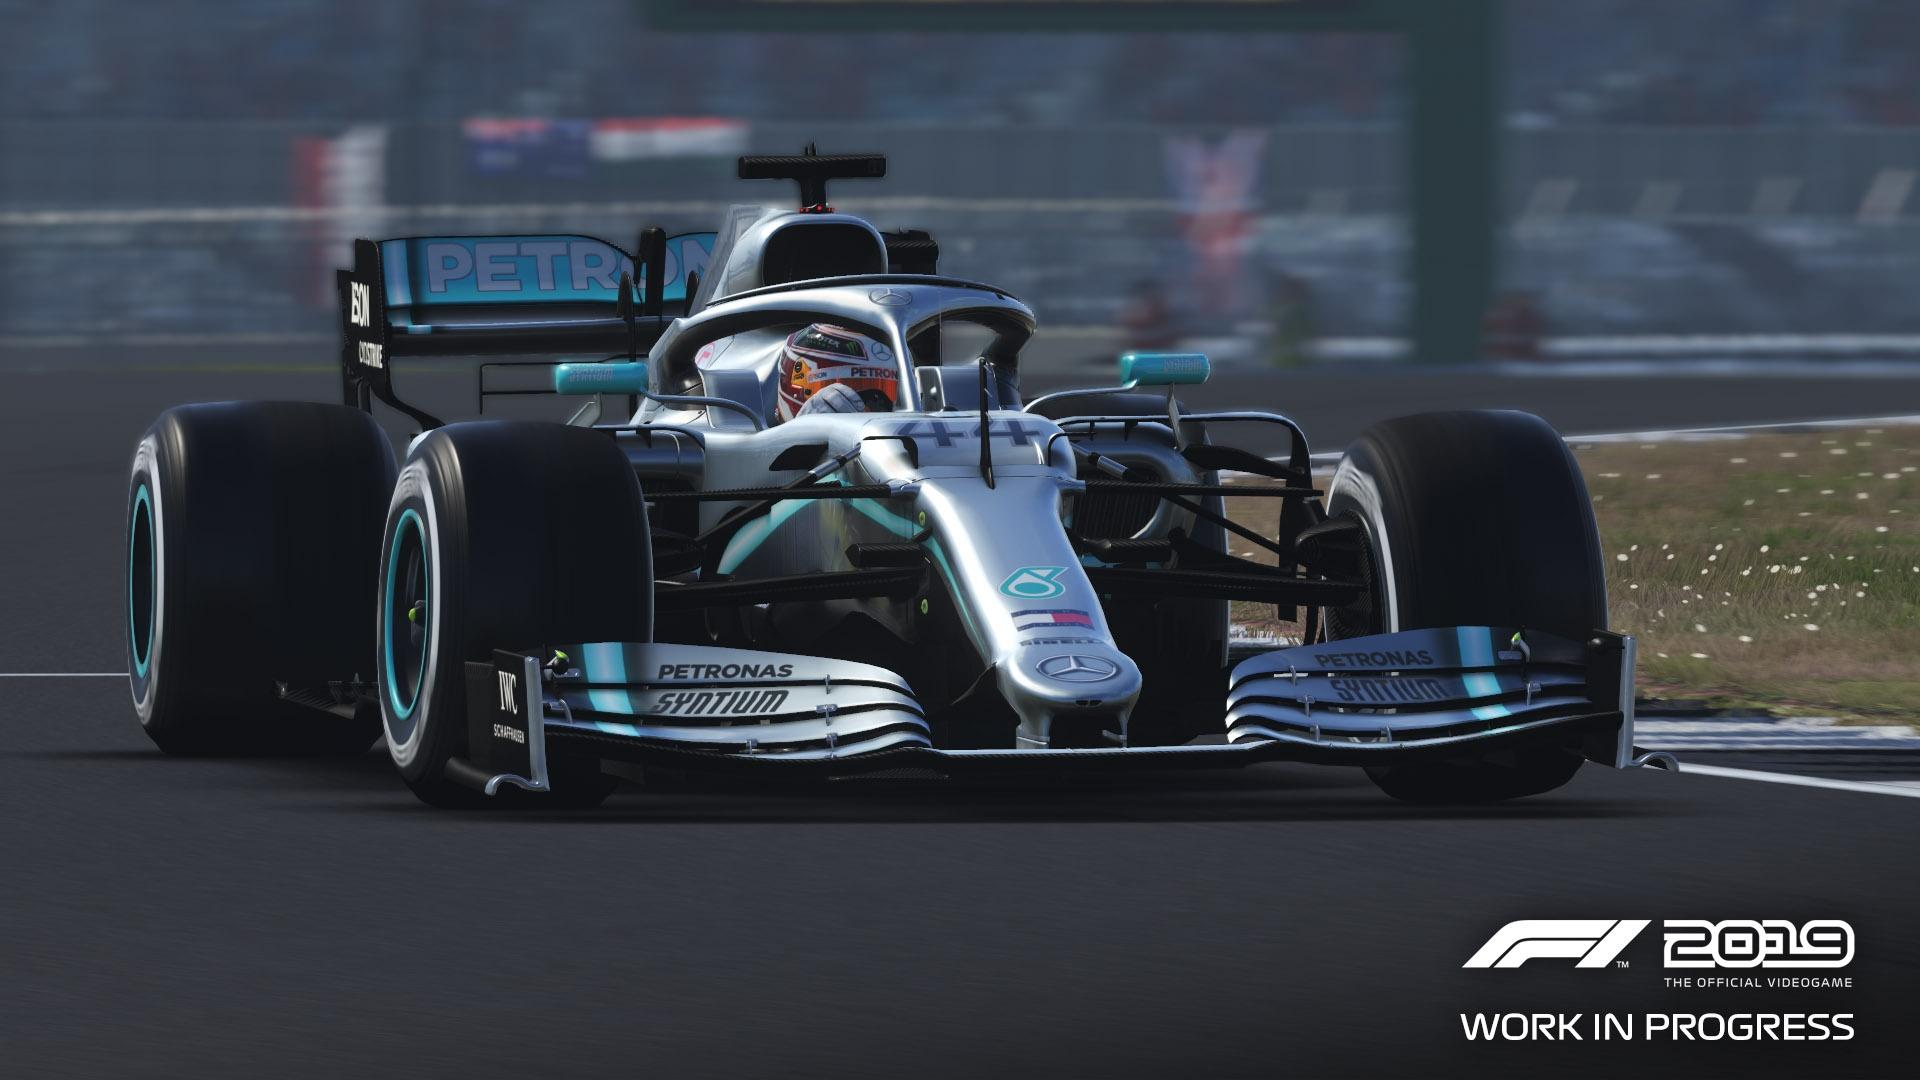 F1 2019 Legends Edition (Codemasters) (RUS|ENG|MULTi) [SteamRip] vano_next